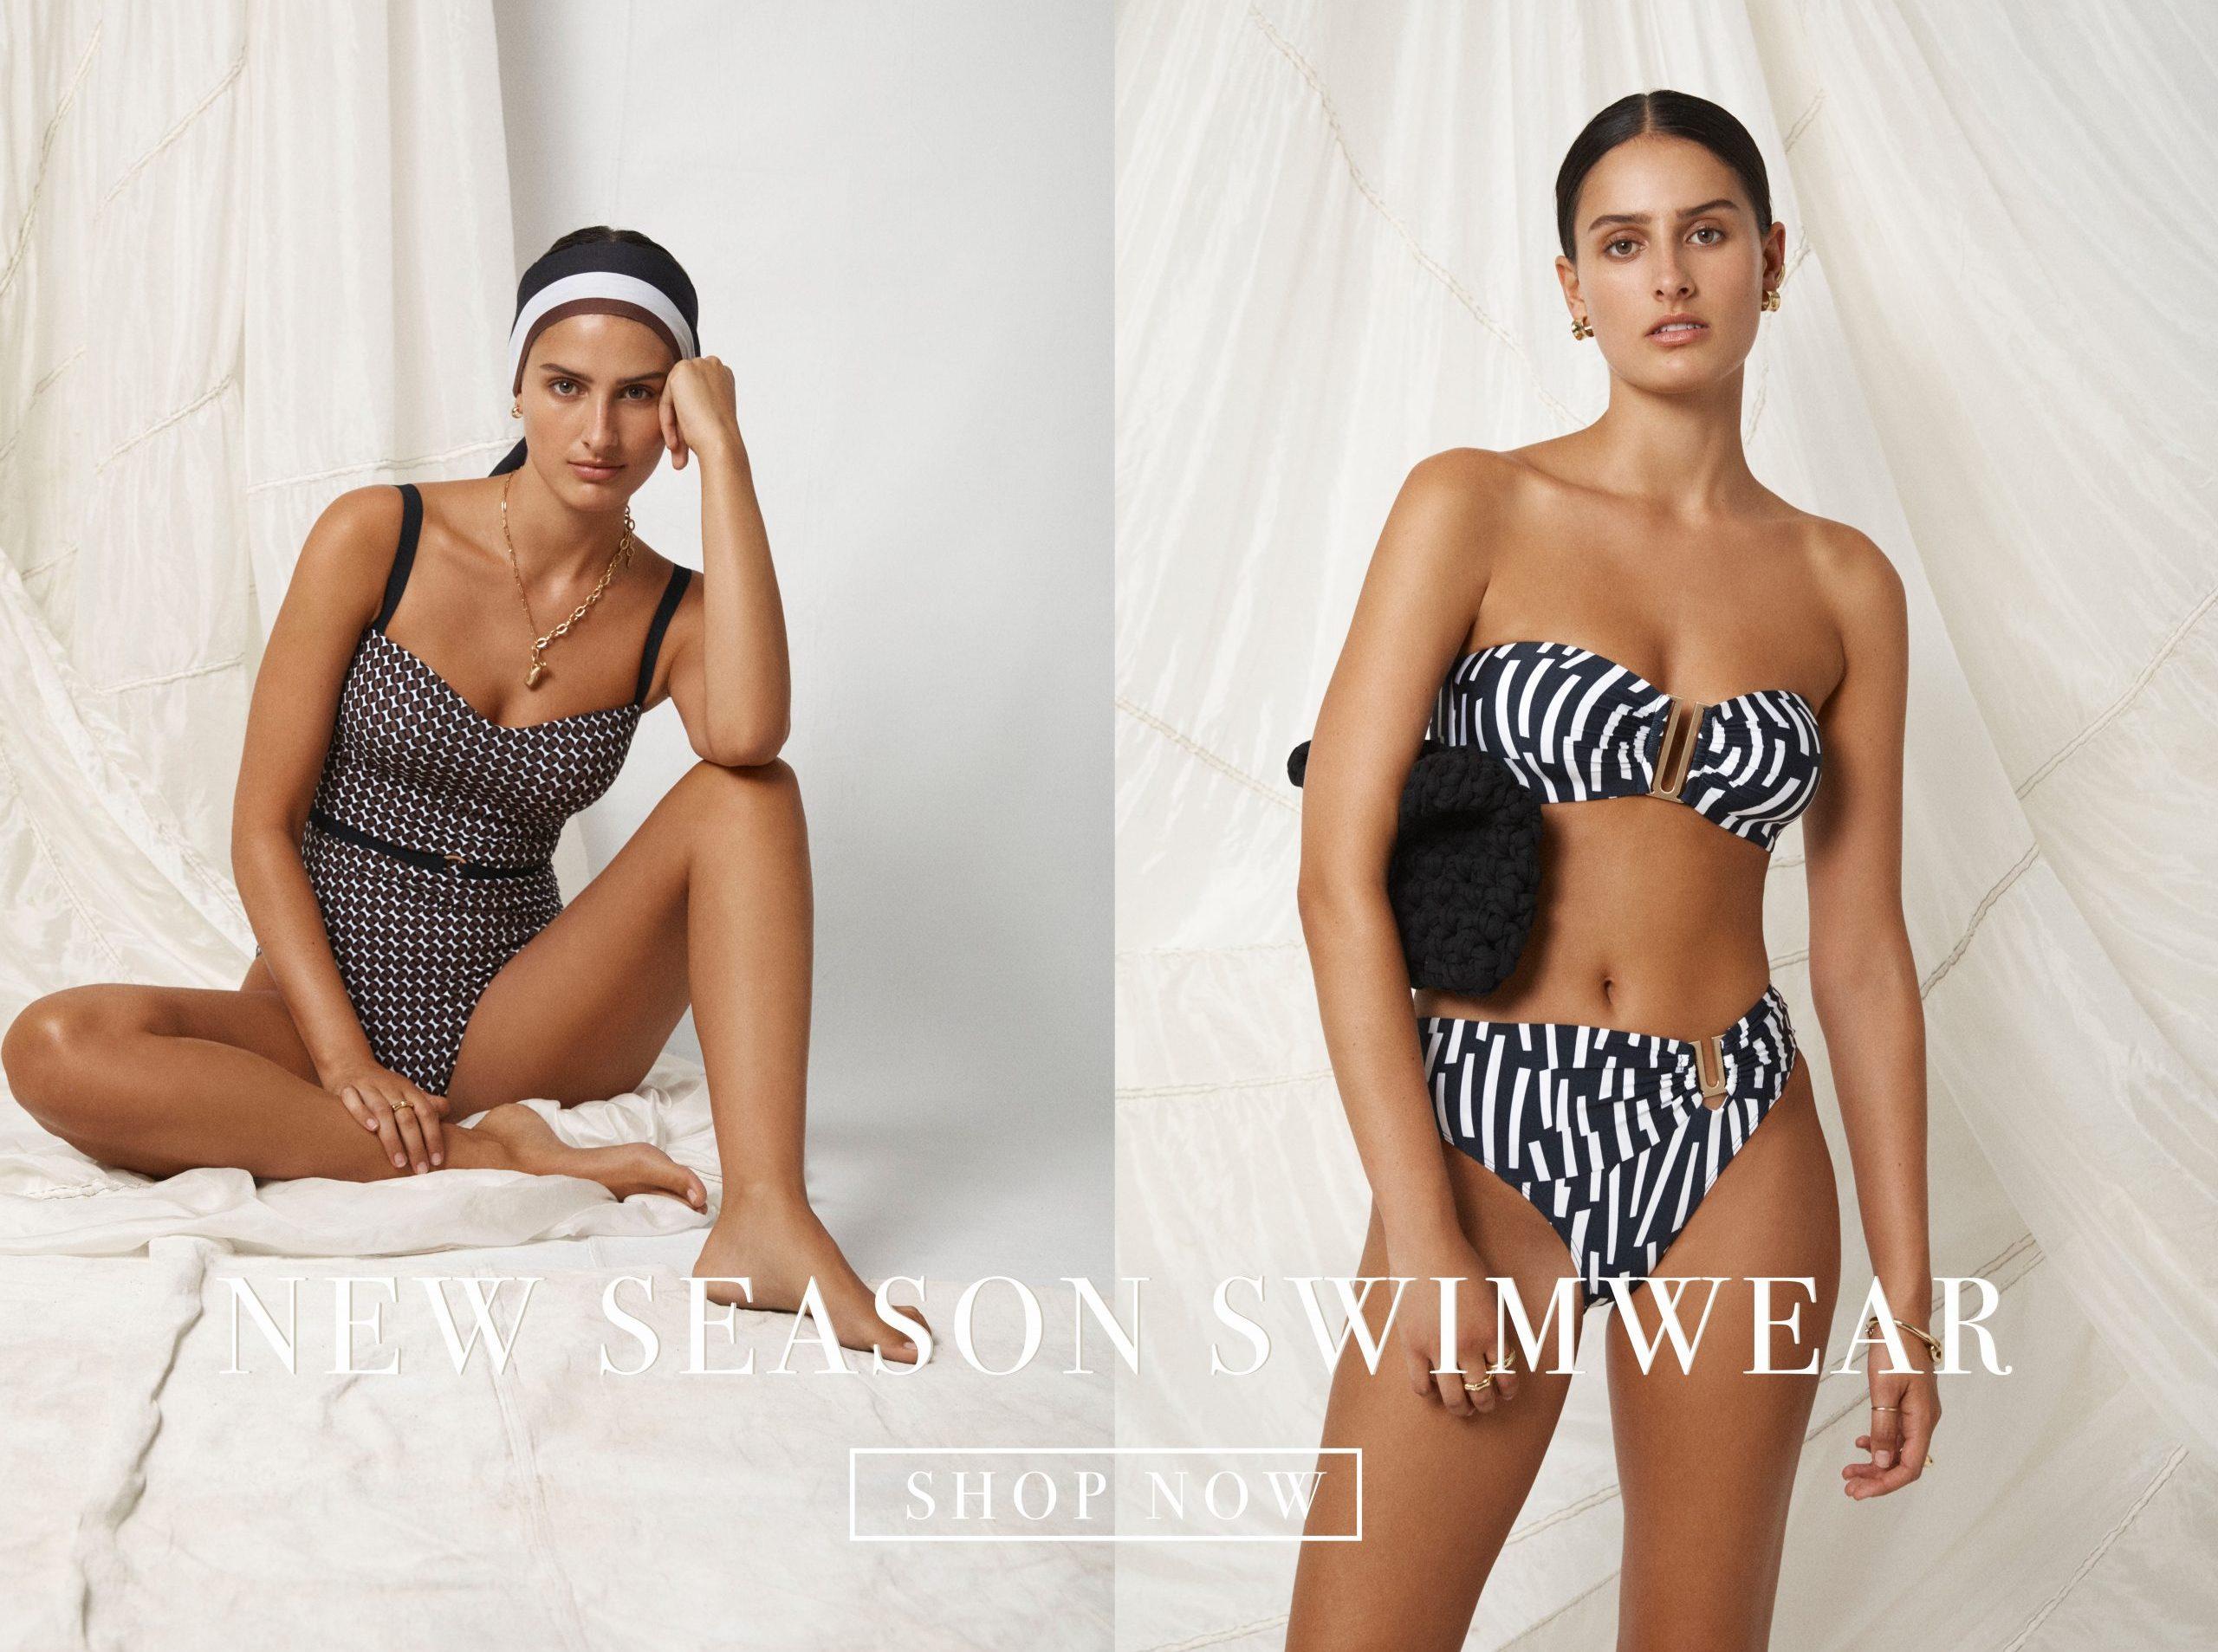 new season swimwear